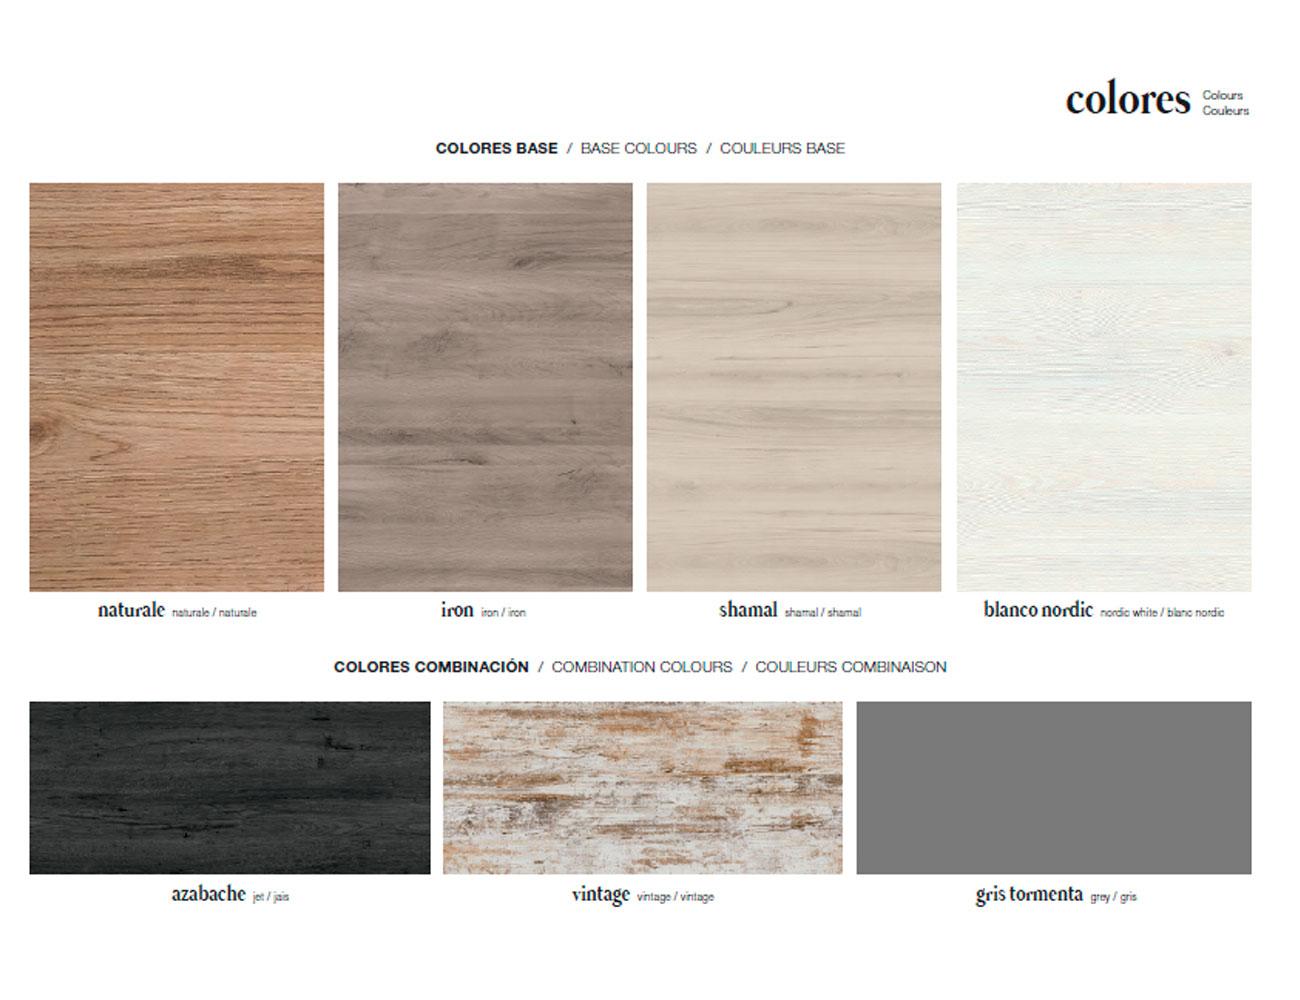 Colores222